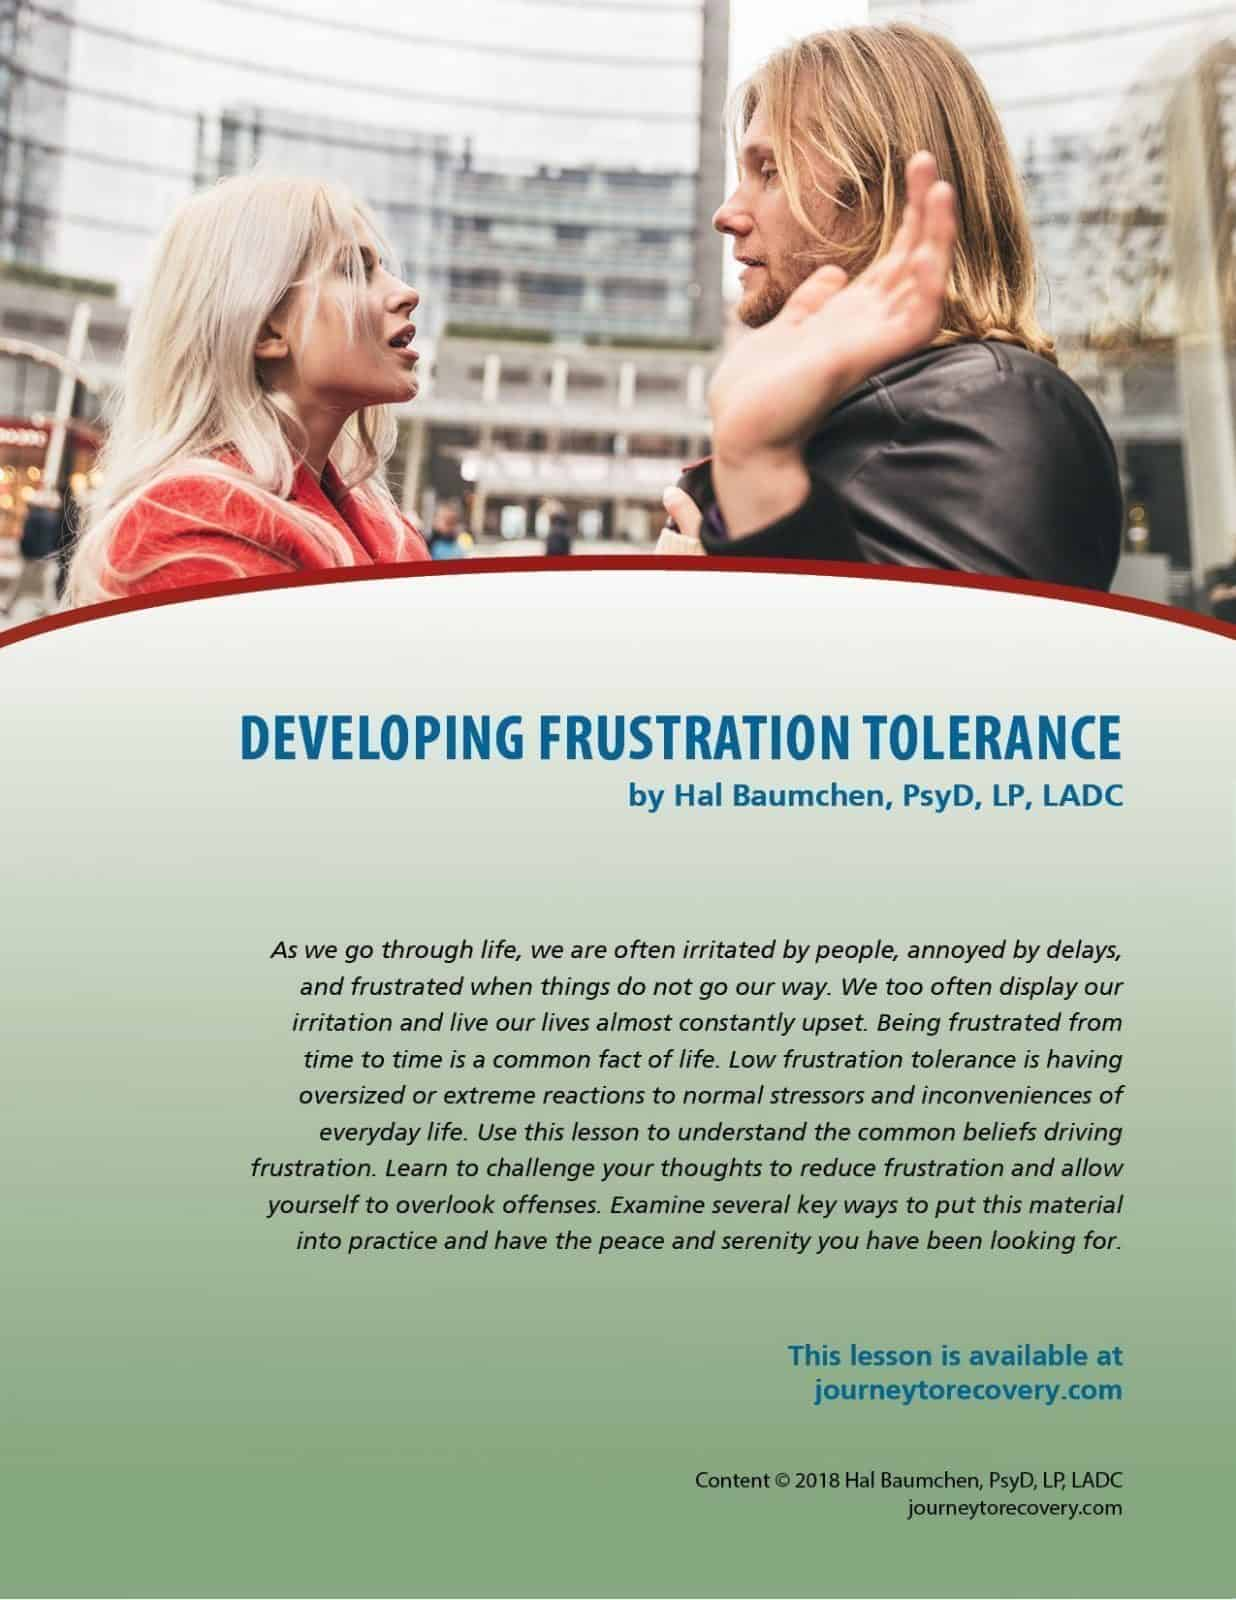 Developing Frustration Tolerance (COD Lesson)